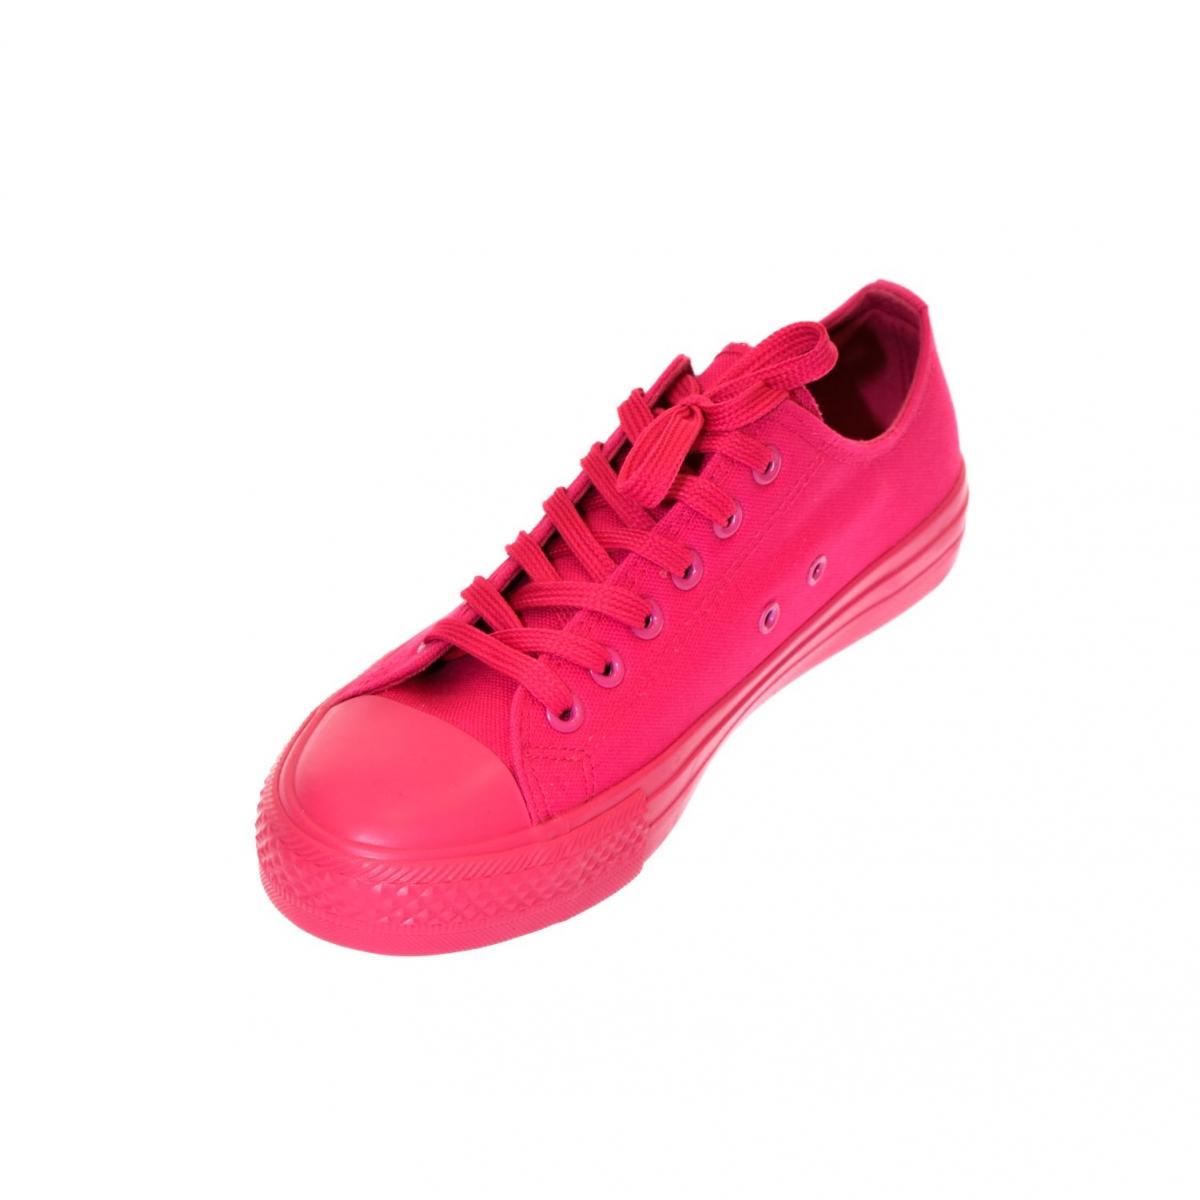 e43e49d85554 Dámske ružové tenisky REINA - 4